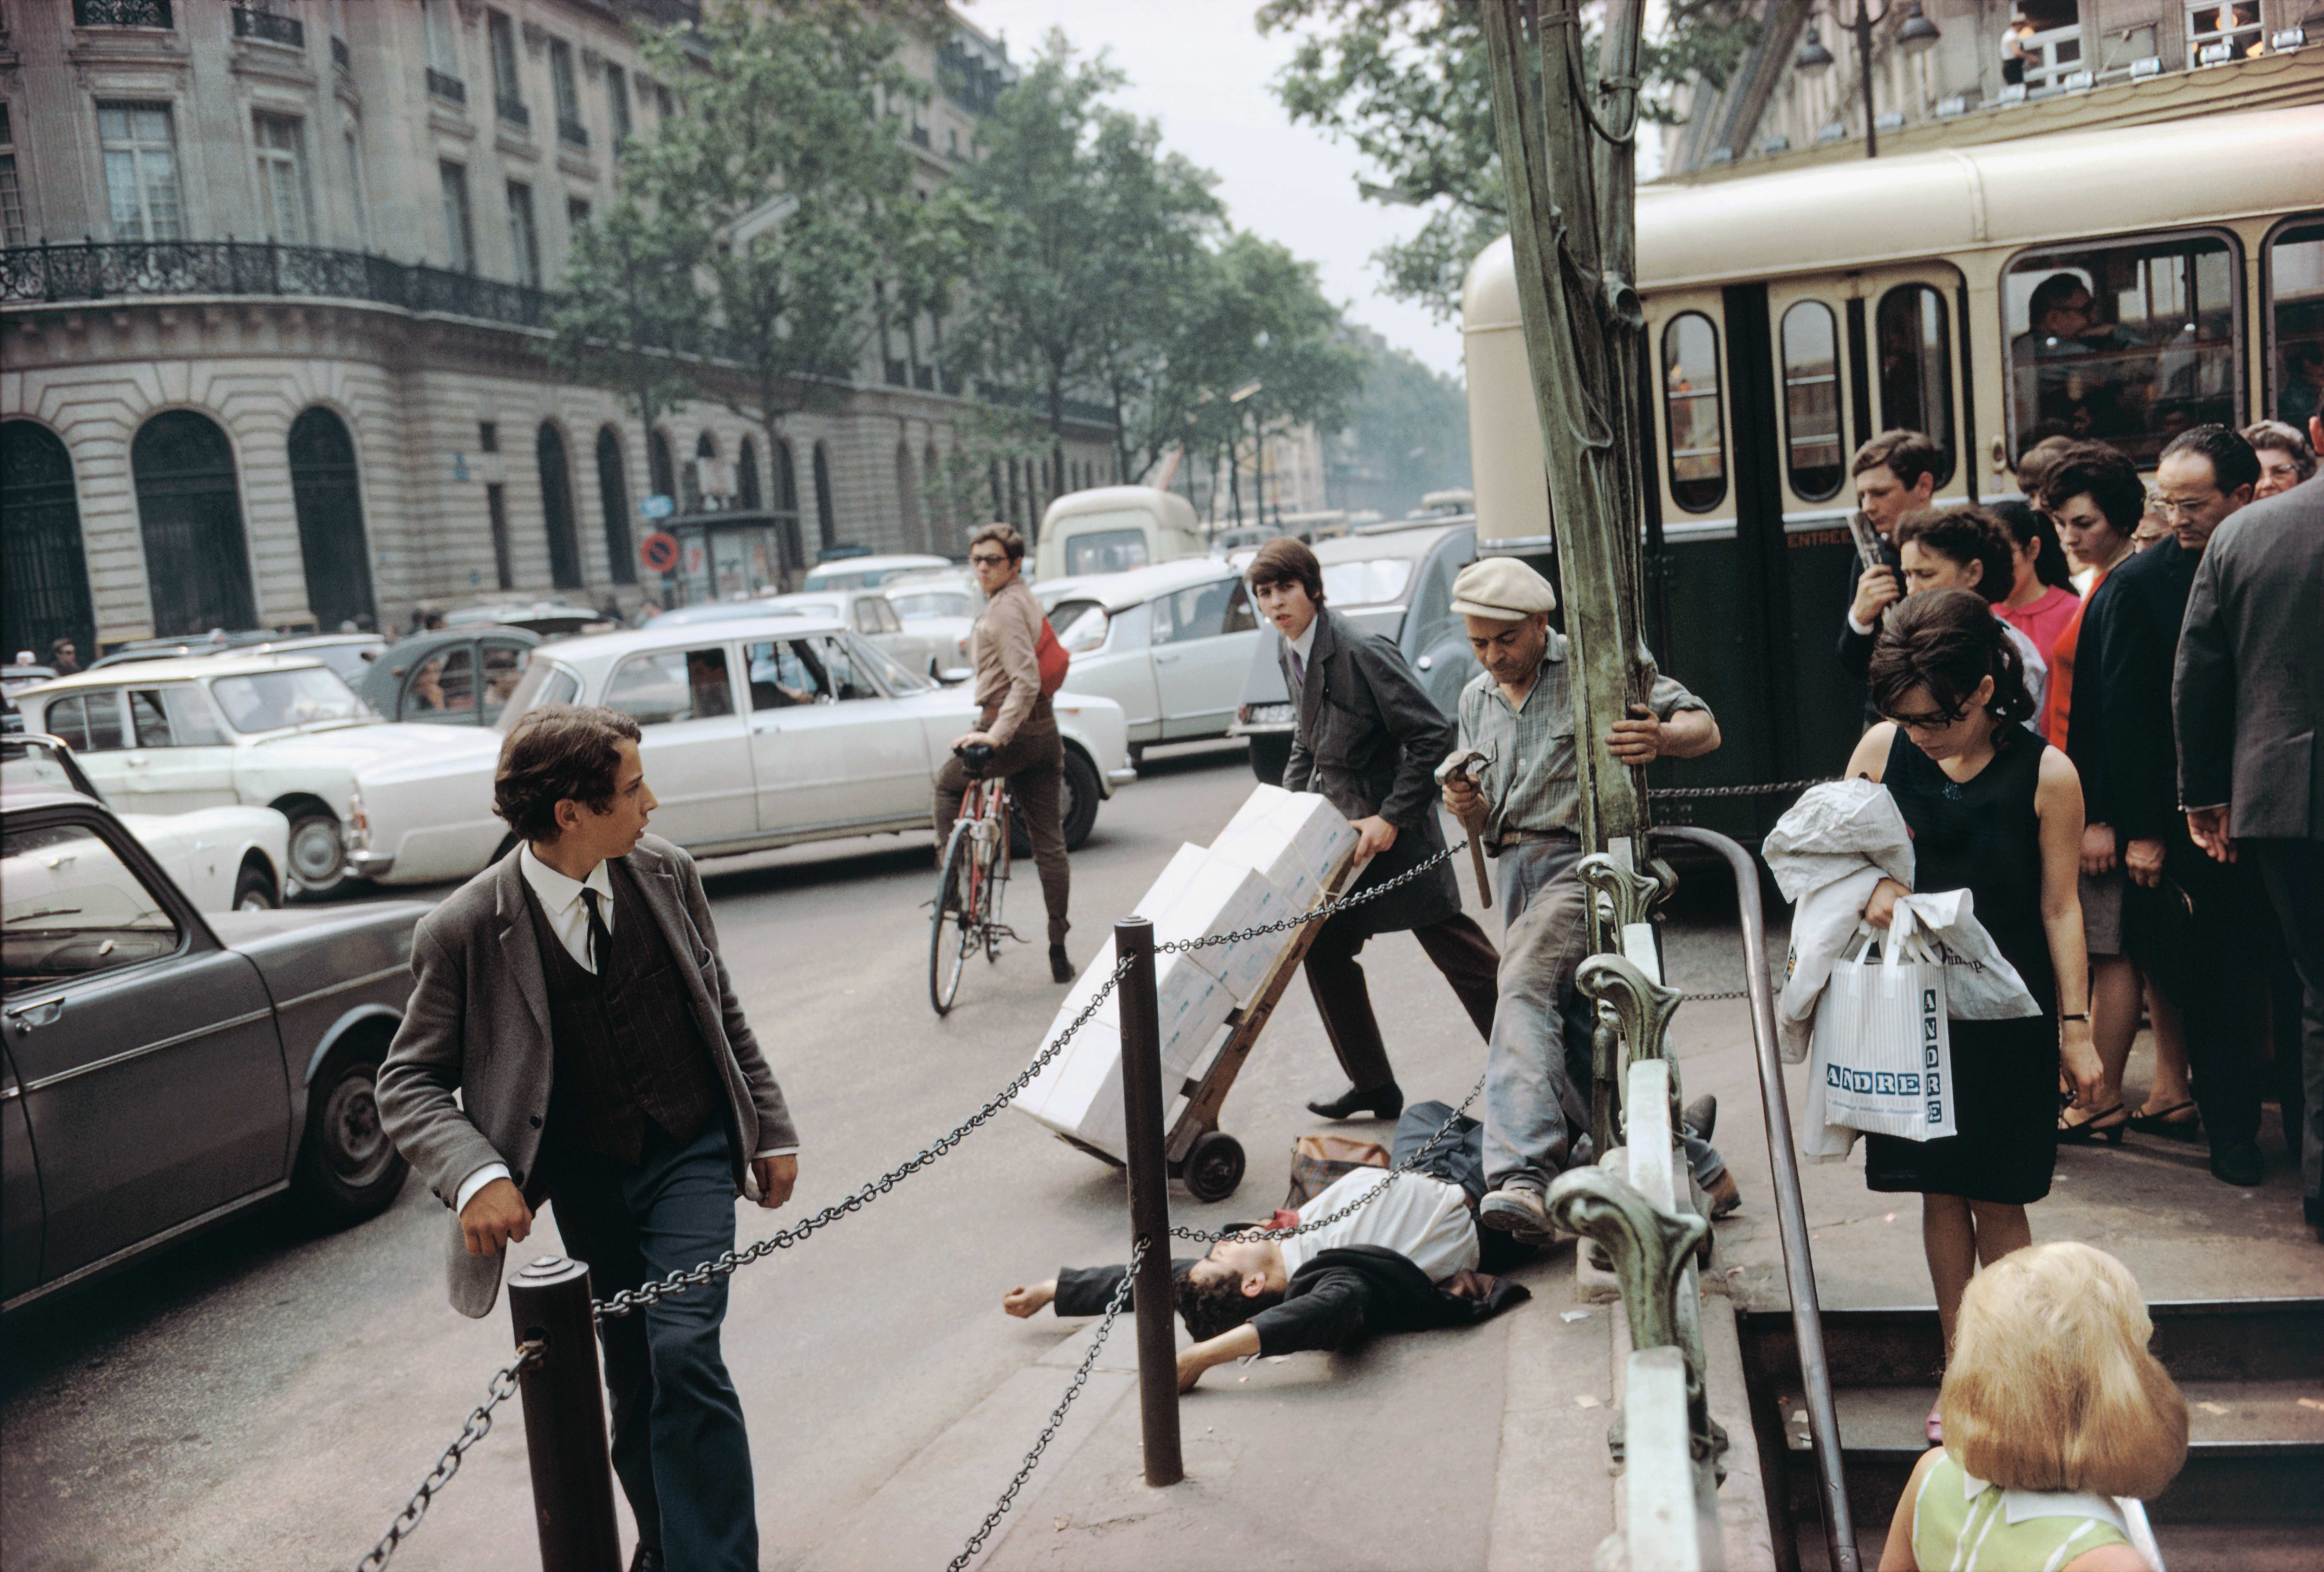 Joel Meyerowitz, Paris, 1967. Courtesy of Joel Meyerowitz